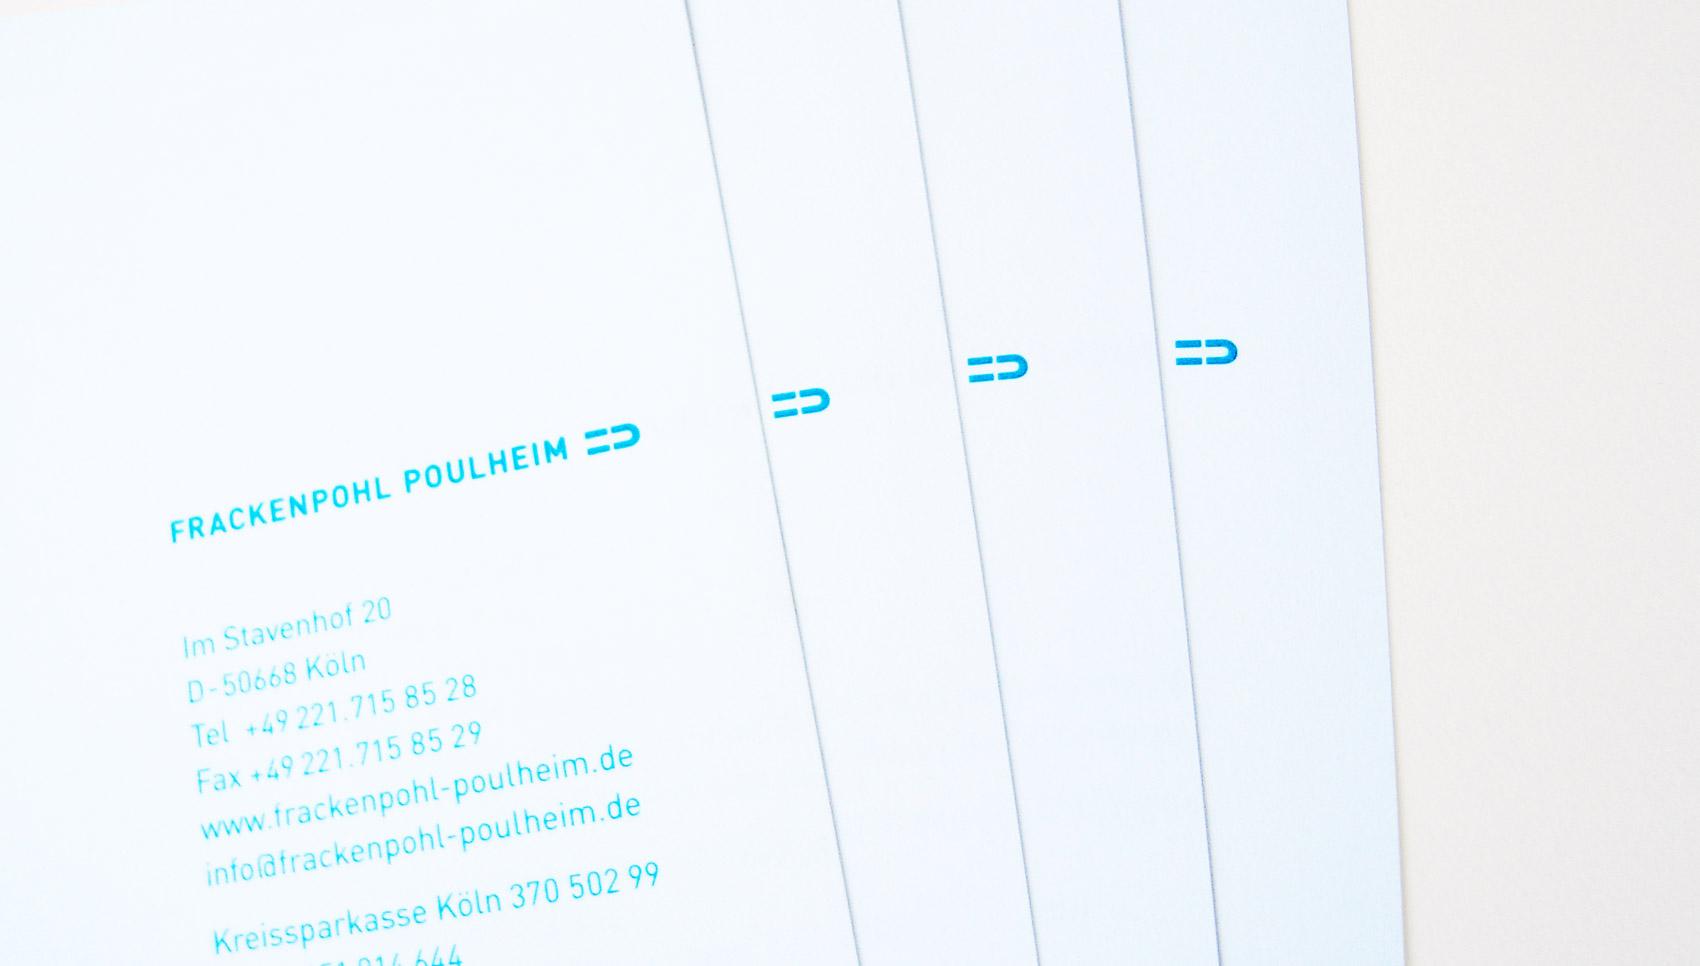 Frackenpohl Poulheim Corporate Design